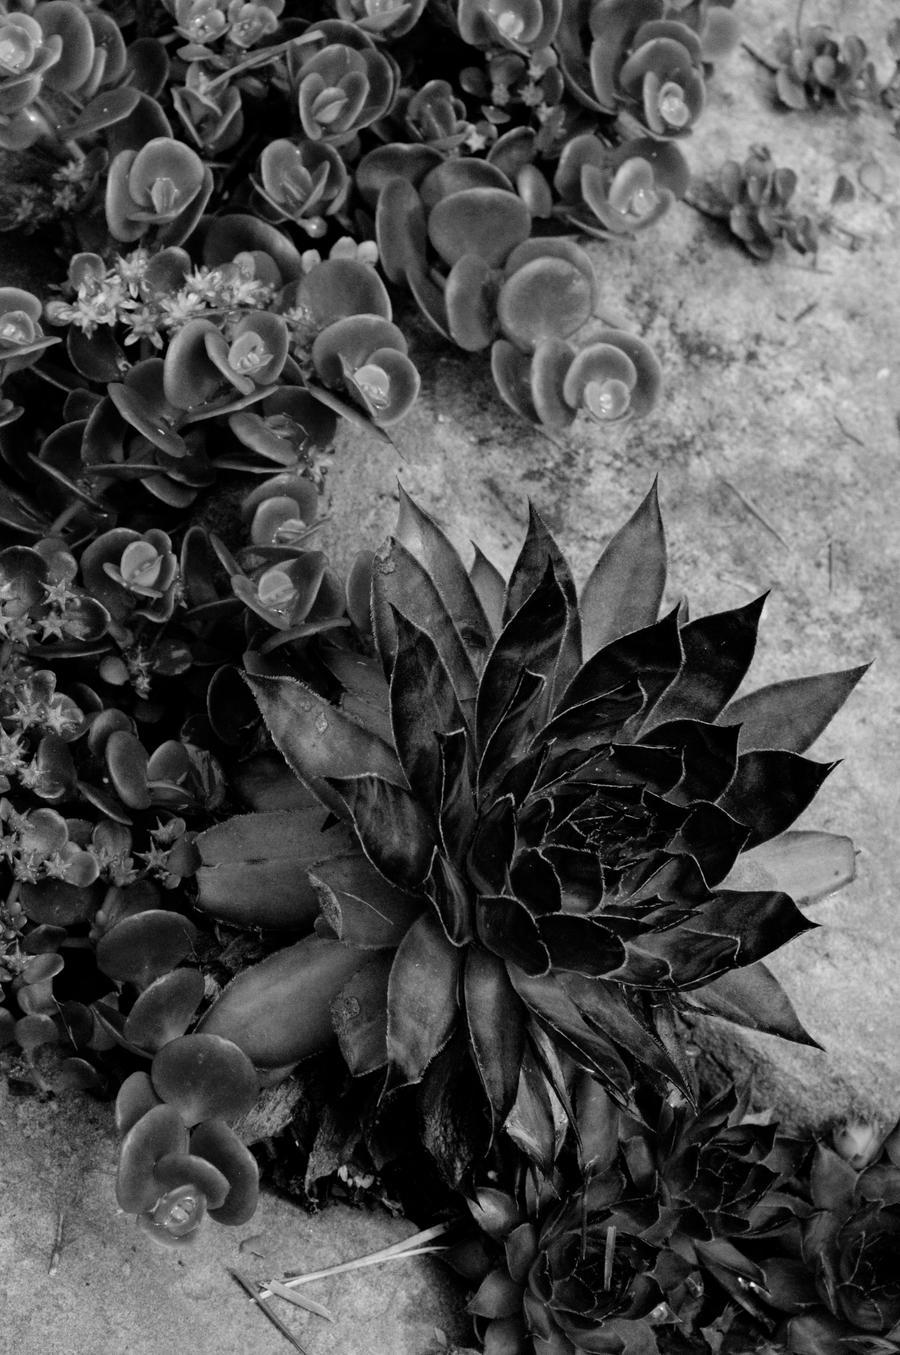 Flower Designs by